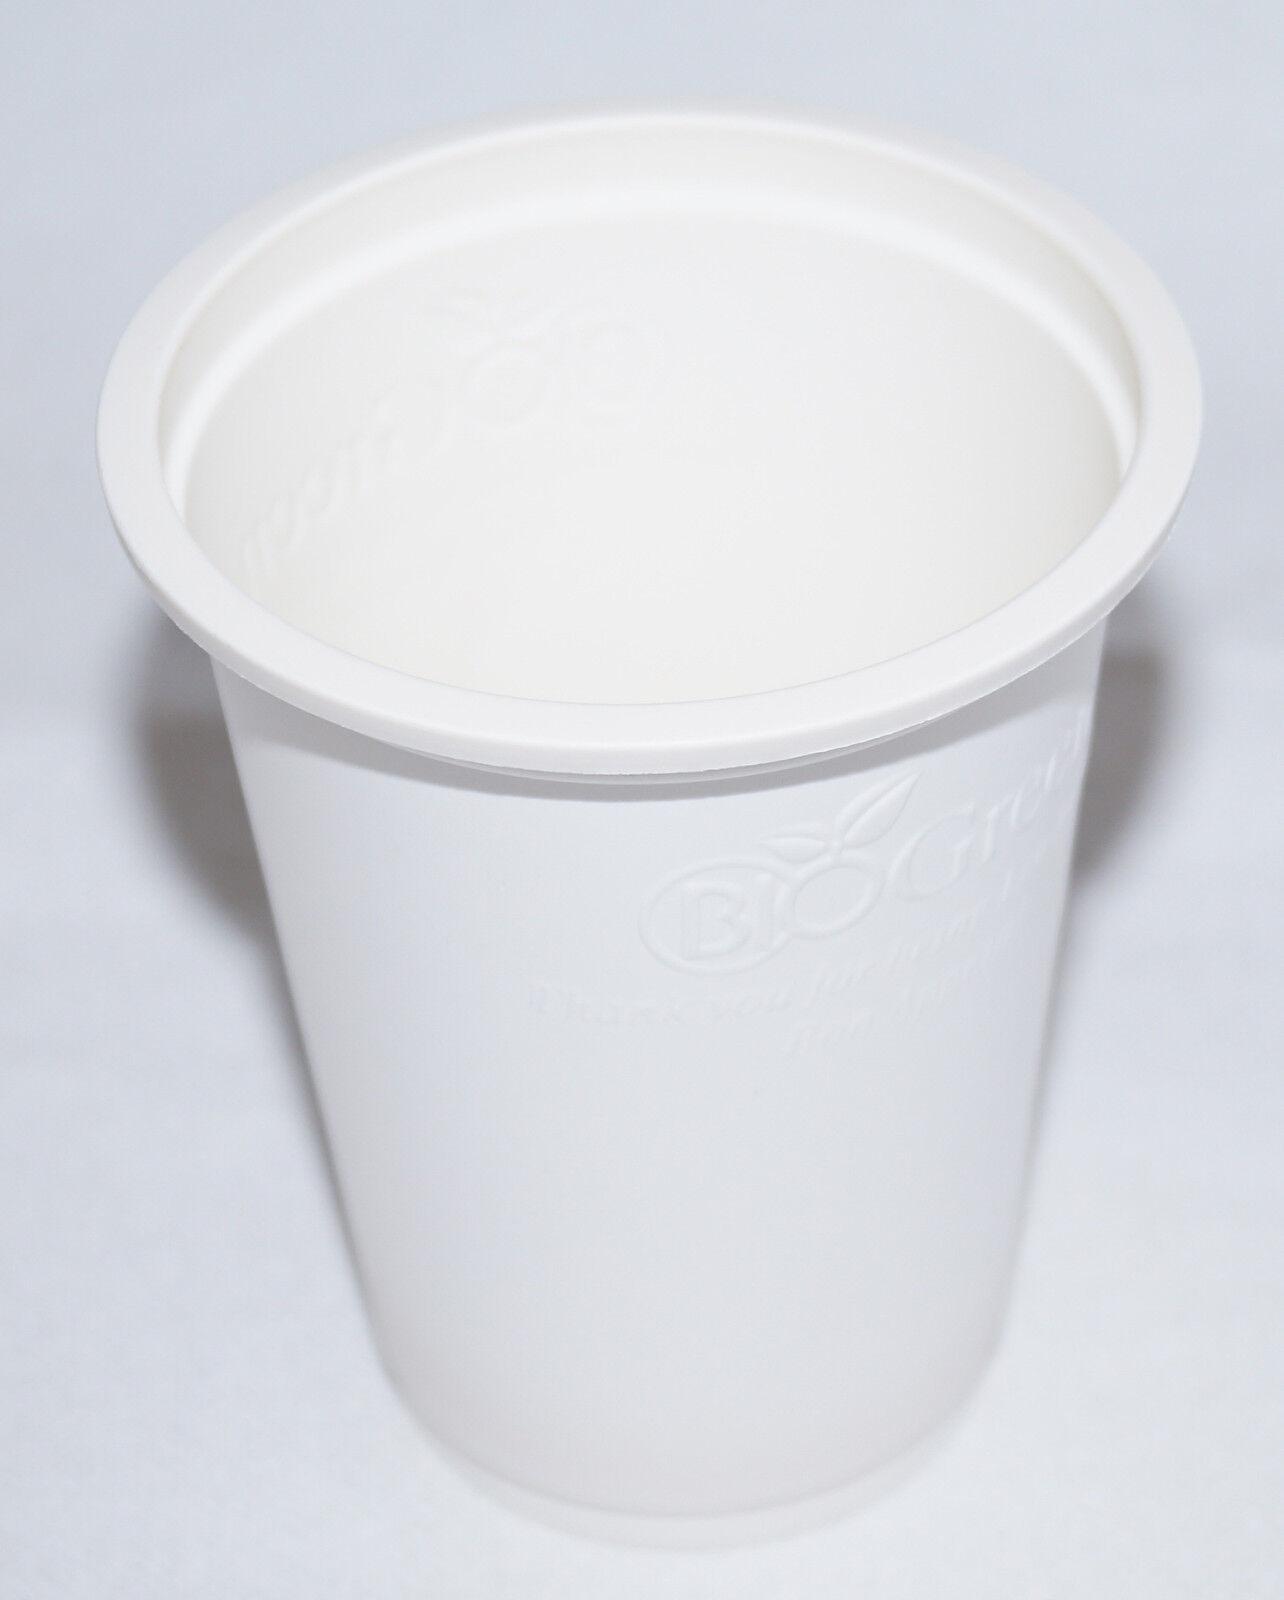 MONOUSO MONOUSO MONOUSO piatti posate stoviglie da granturco kompostierbar biodegradabili 73d8e2